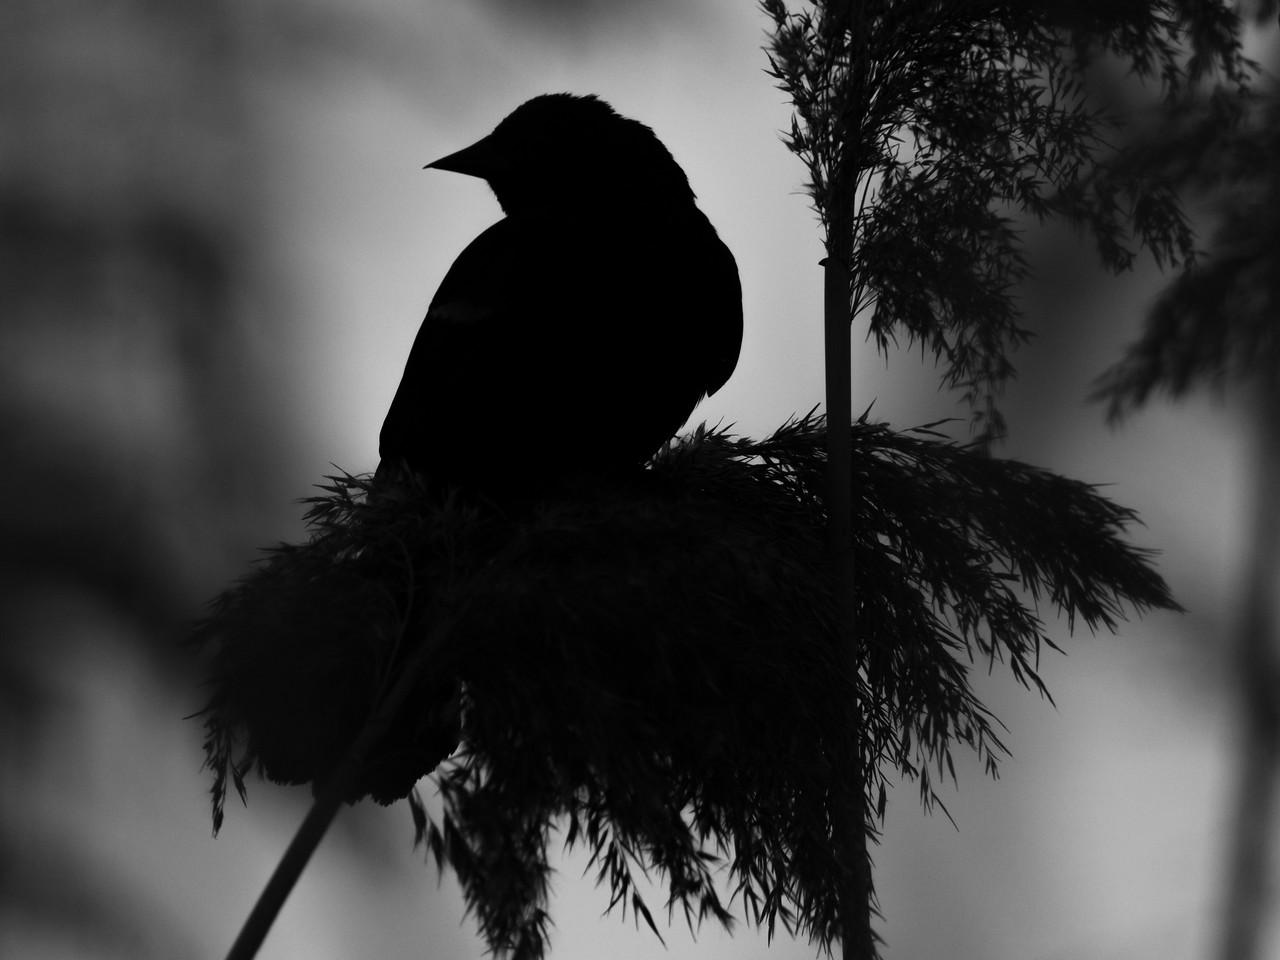 Red-winged Blackbird Silhouette